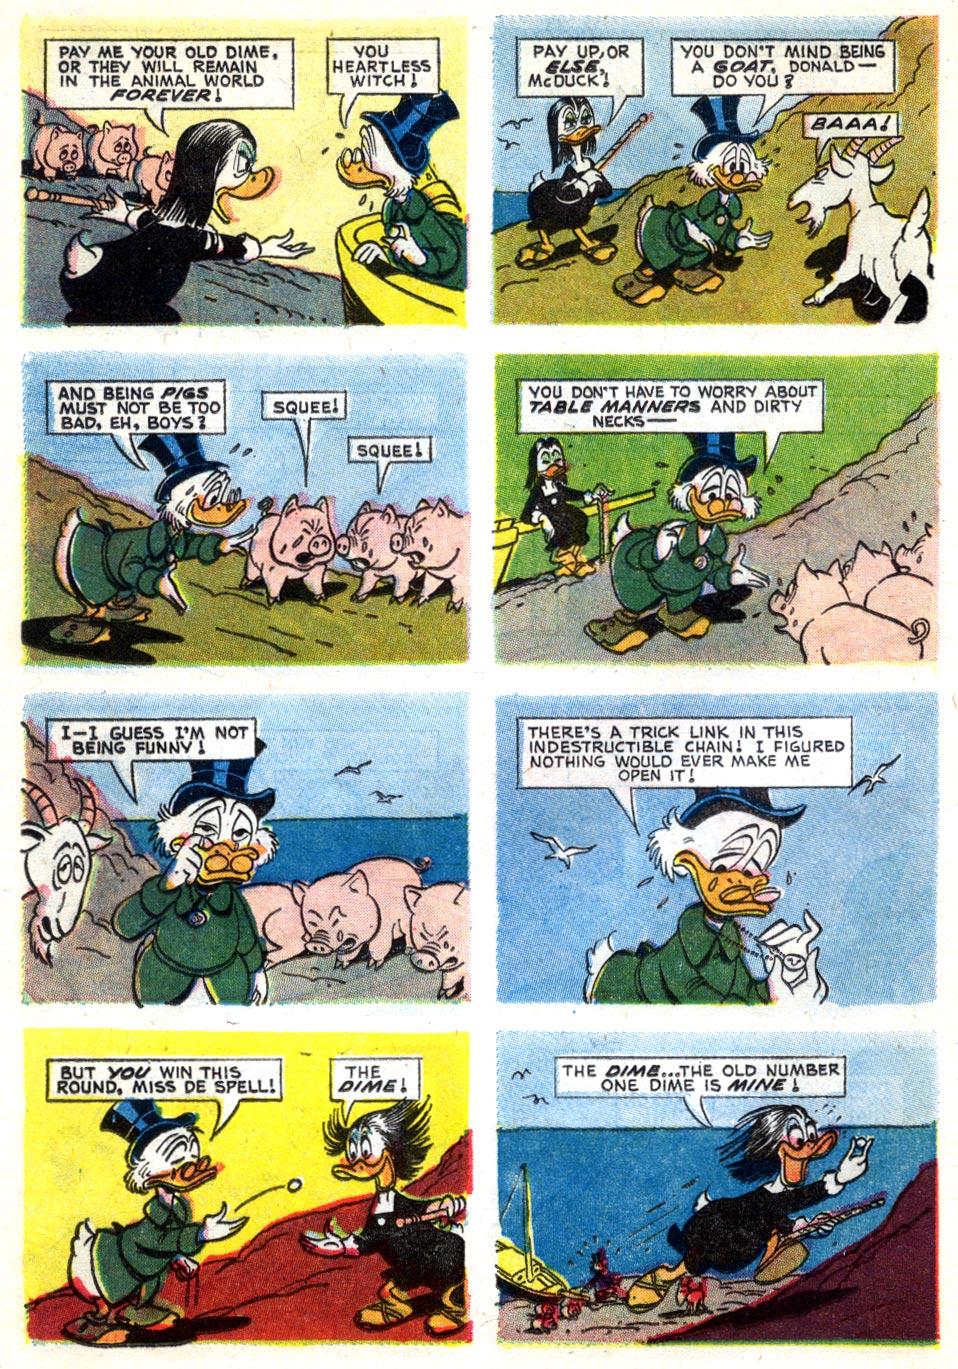 (1953) Issue #329 </opti #365 - English 16